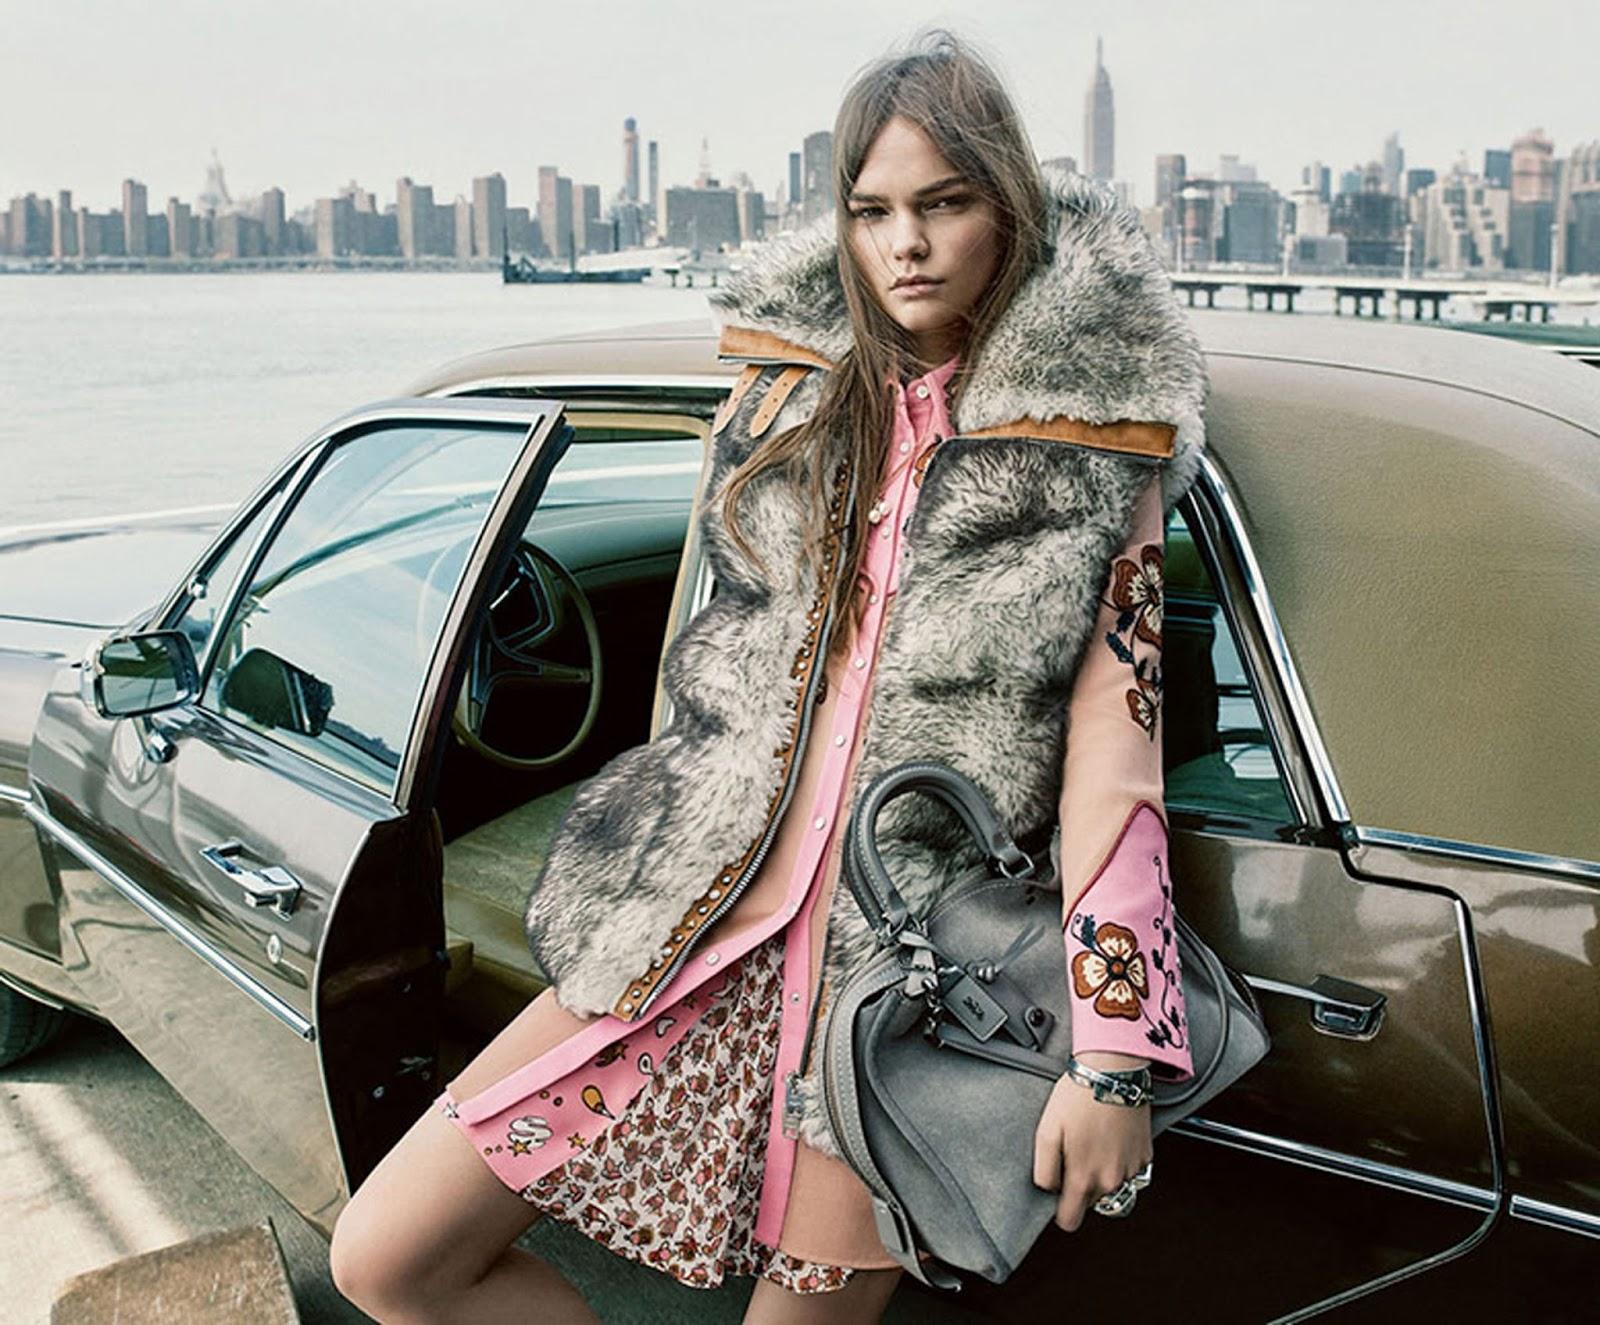 Eniwhere Fashion - Steven Meisel - FW2016-17 Campaigns